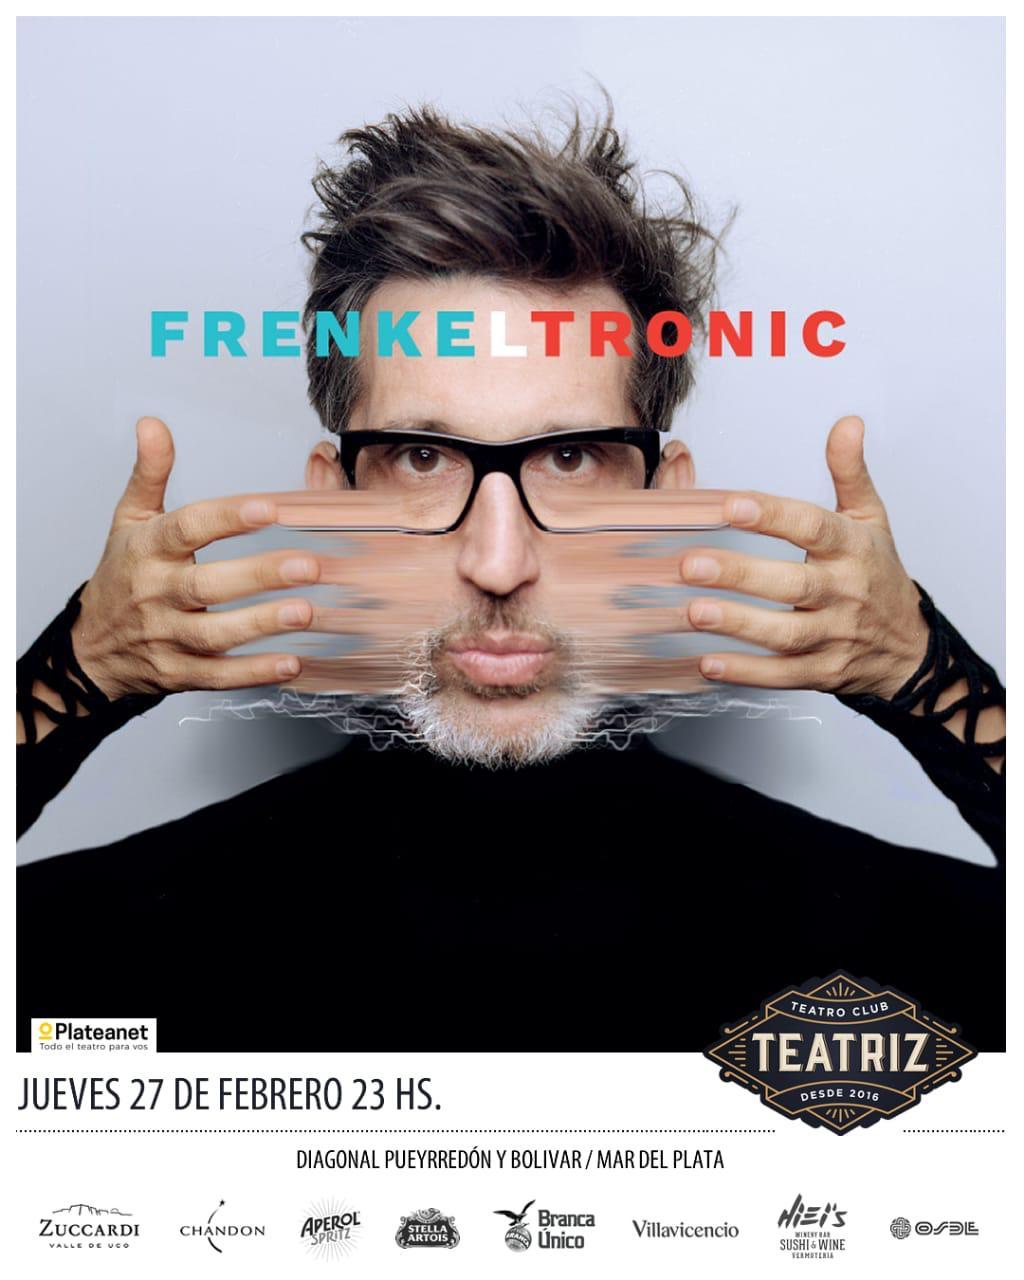 Diego Frenkel presenta nuevo material en Teatriz